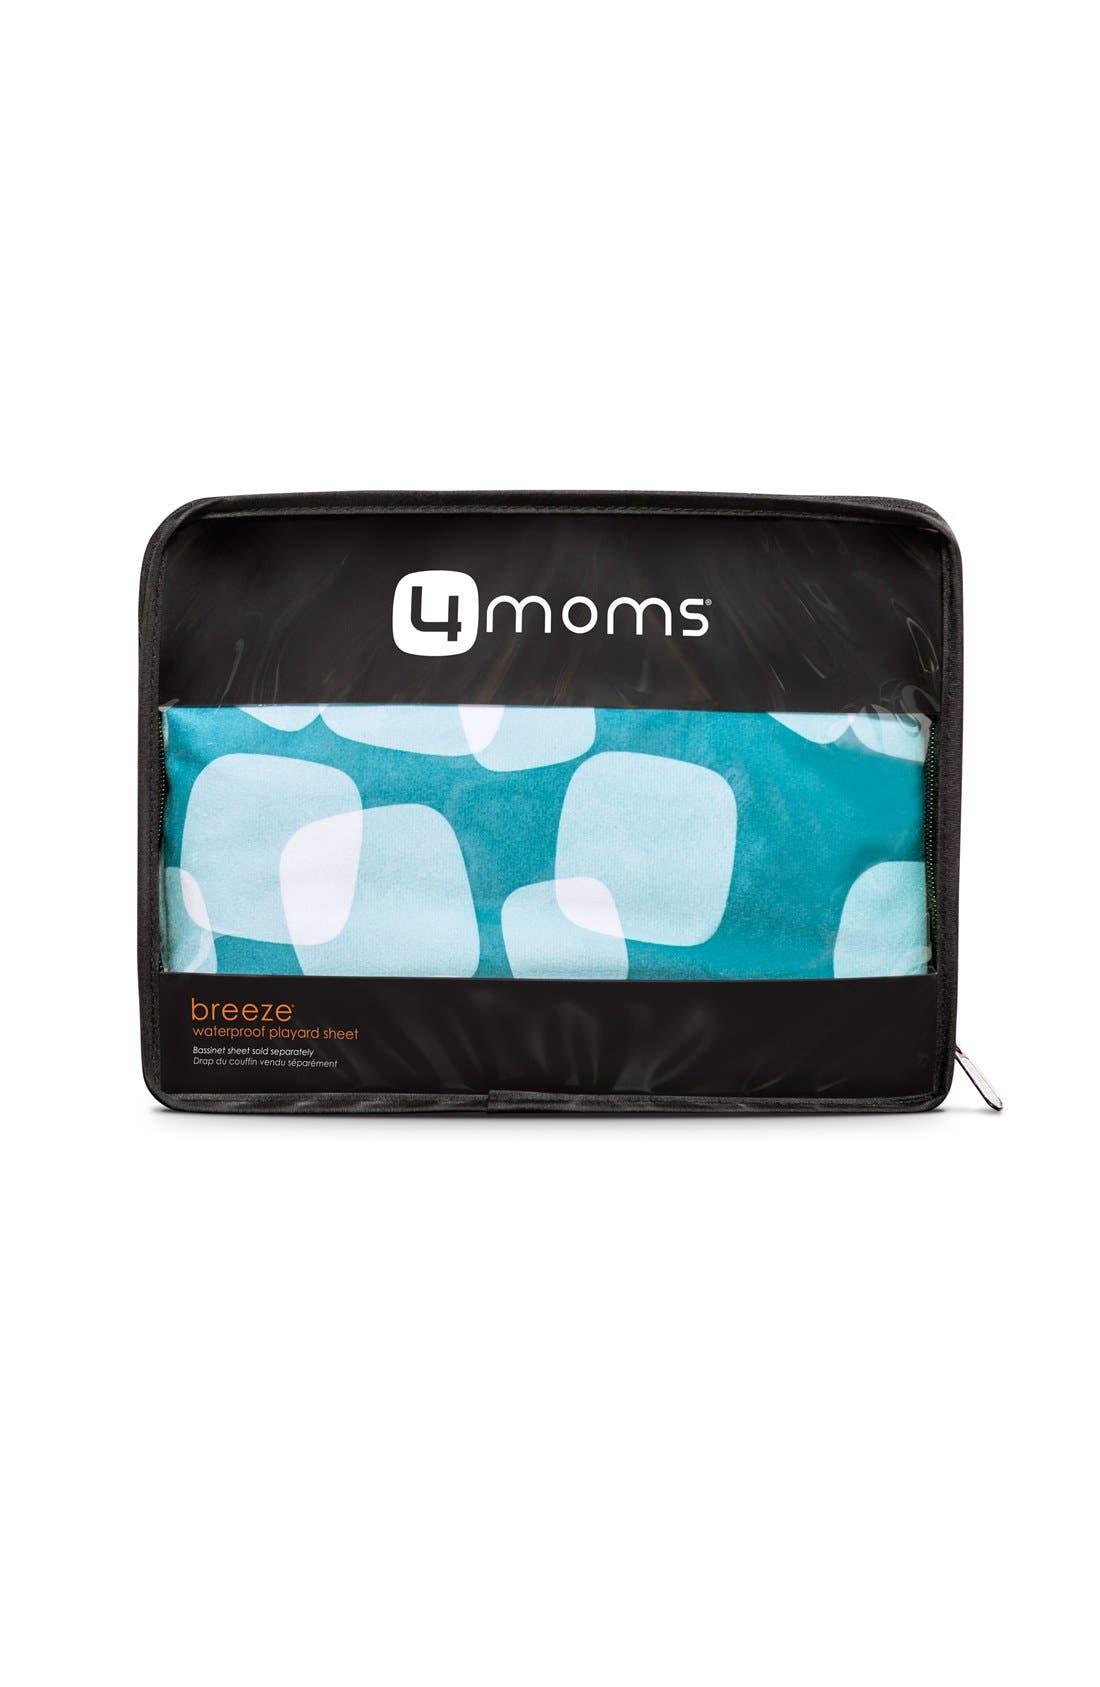 Main Image - 4moms 'Breeze' Waterproof Playard Sheet